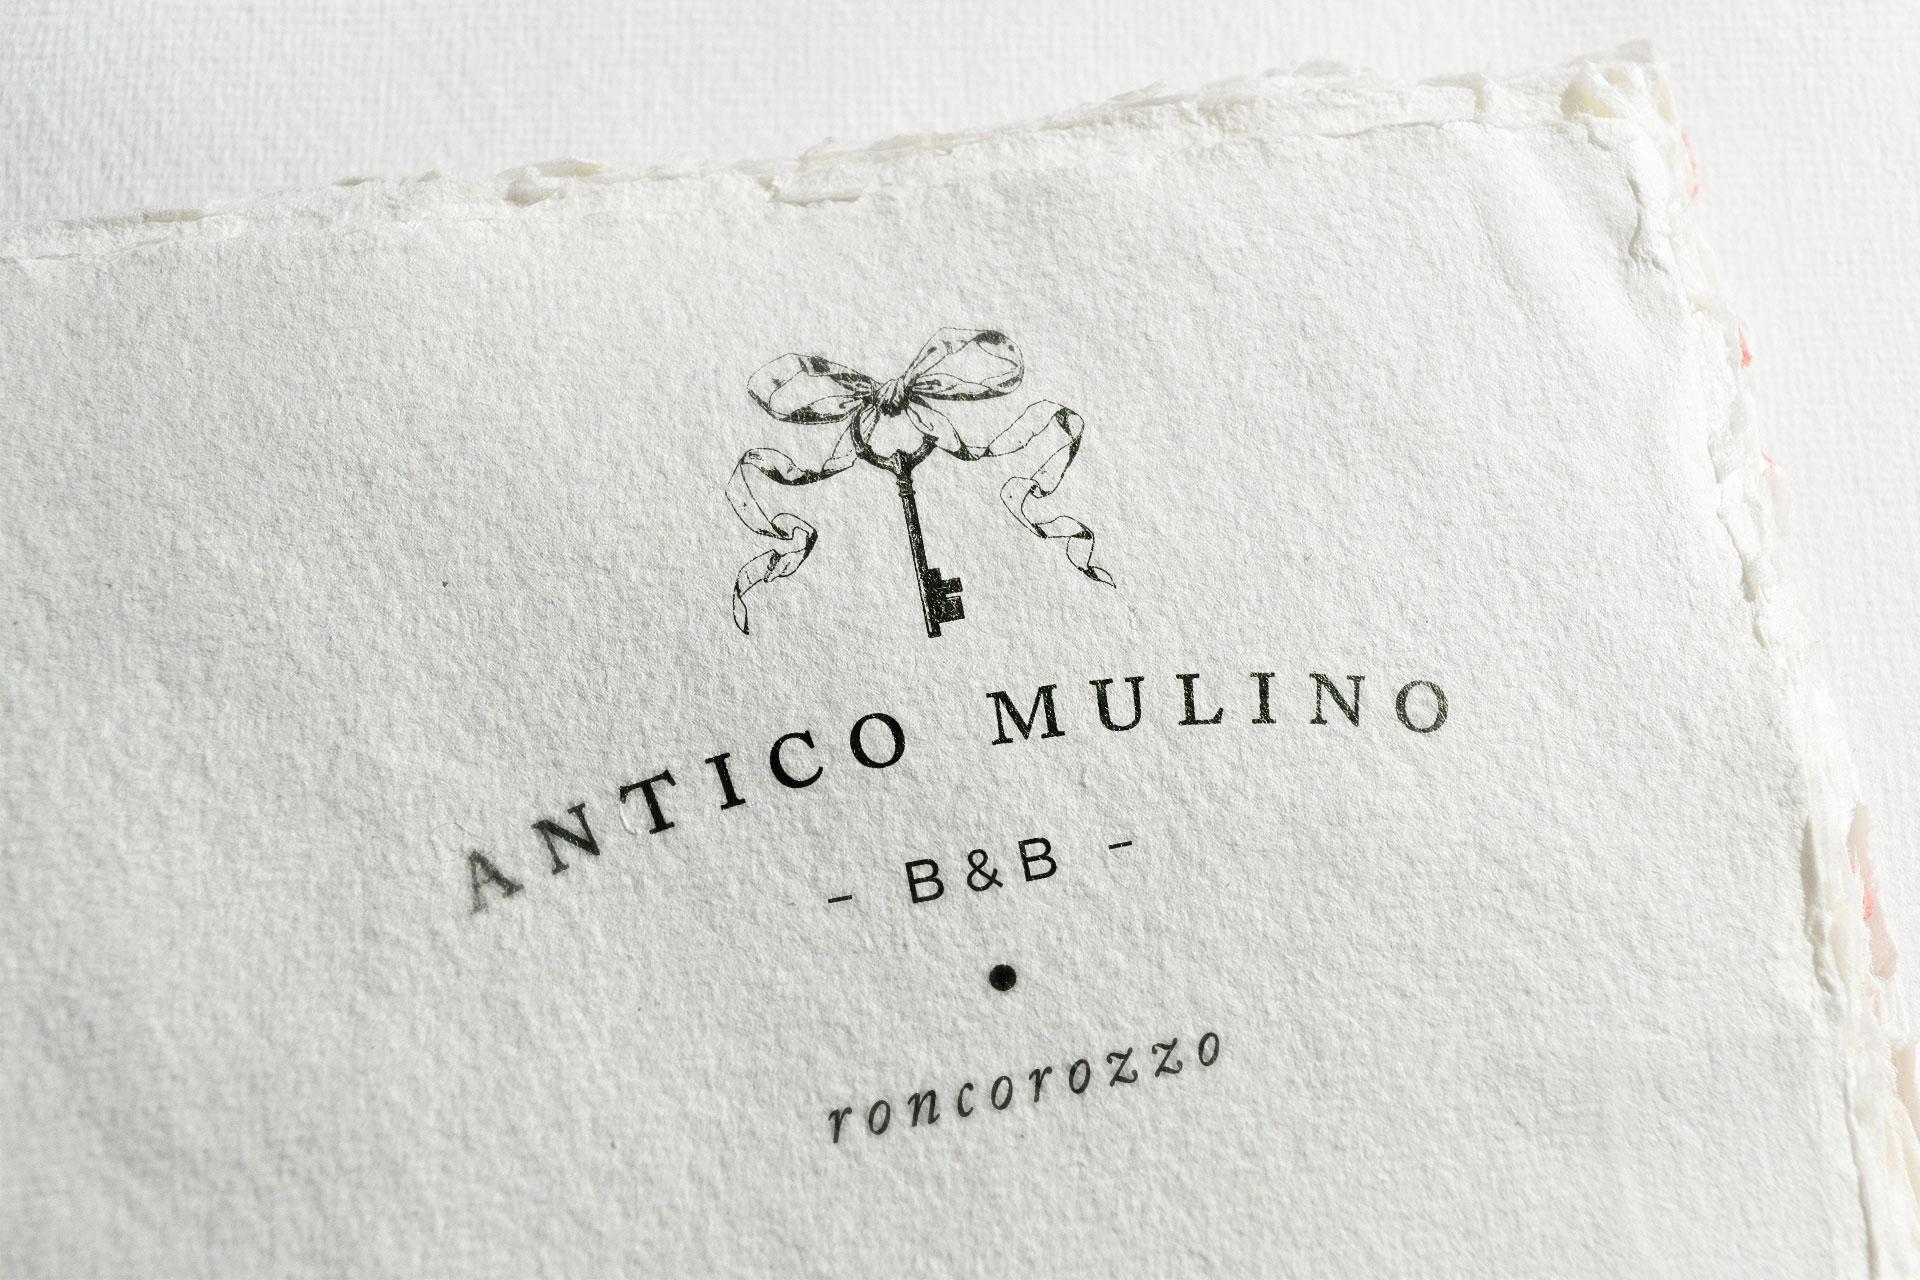 Antico Mulino b&b